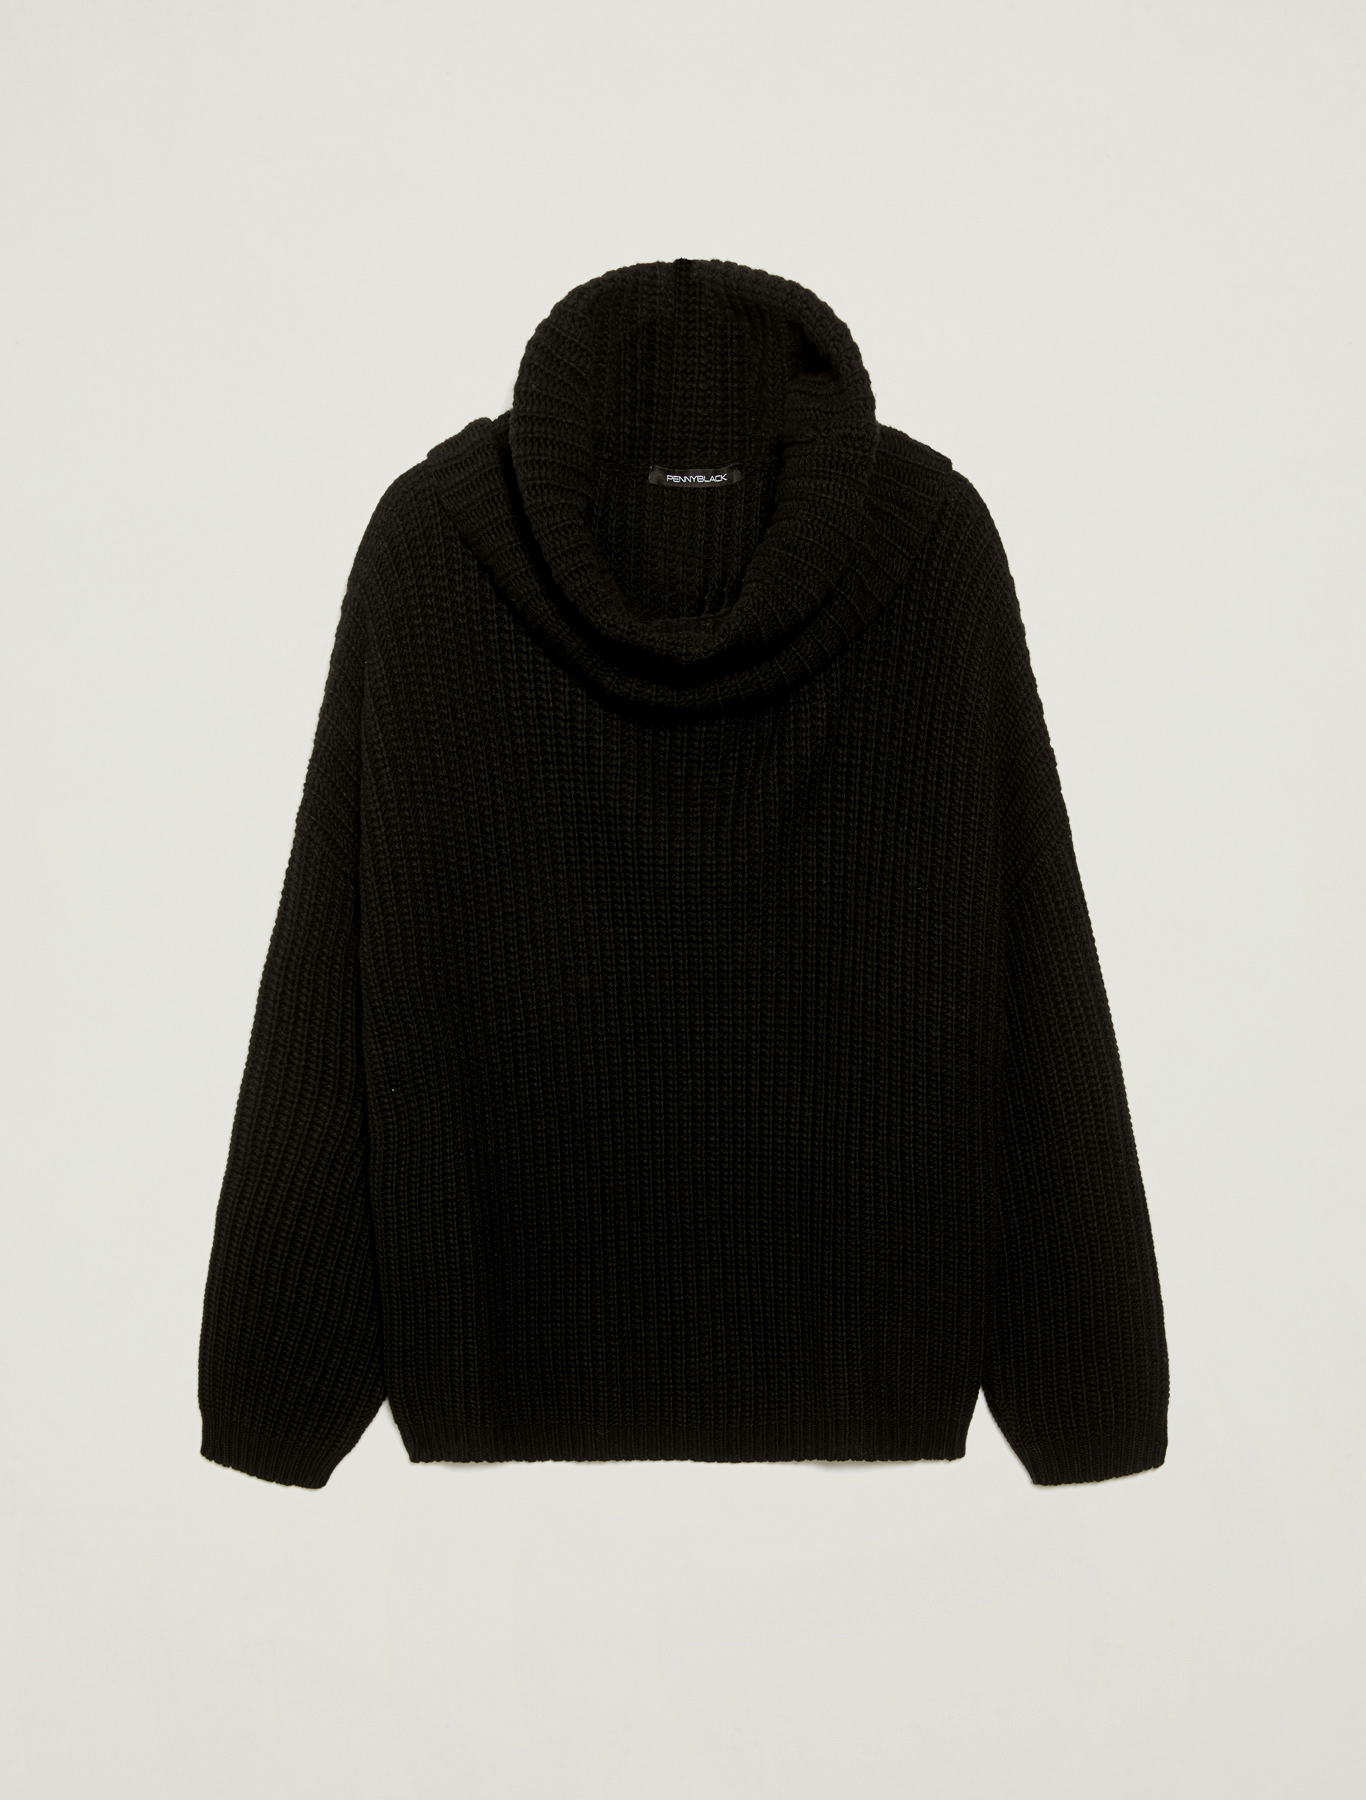 Oversize jumper with maxi-neck - black - pennyblack